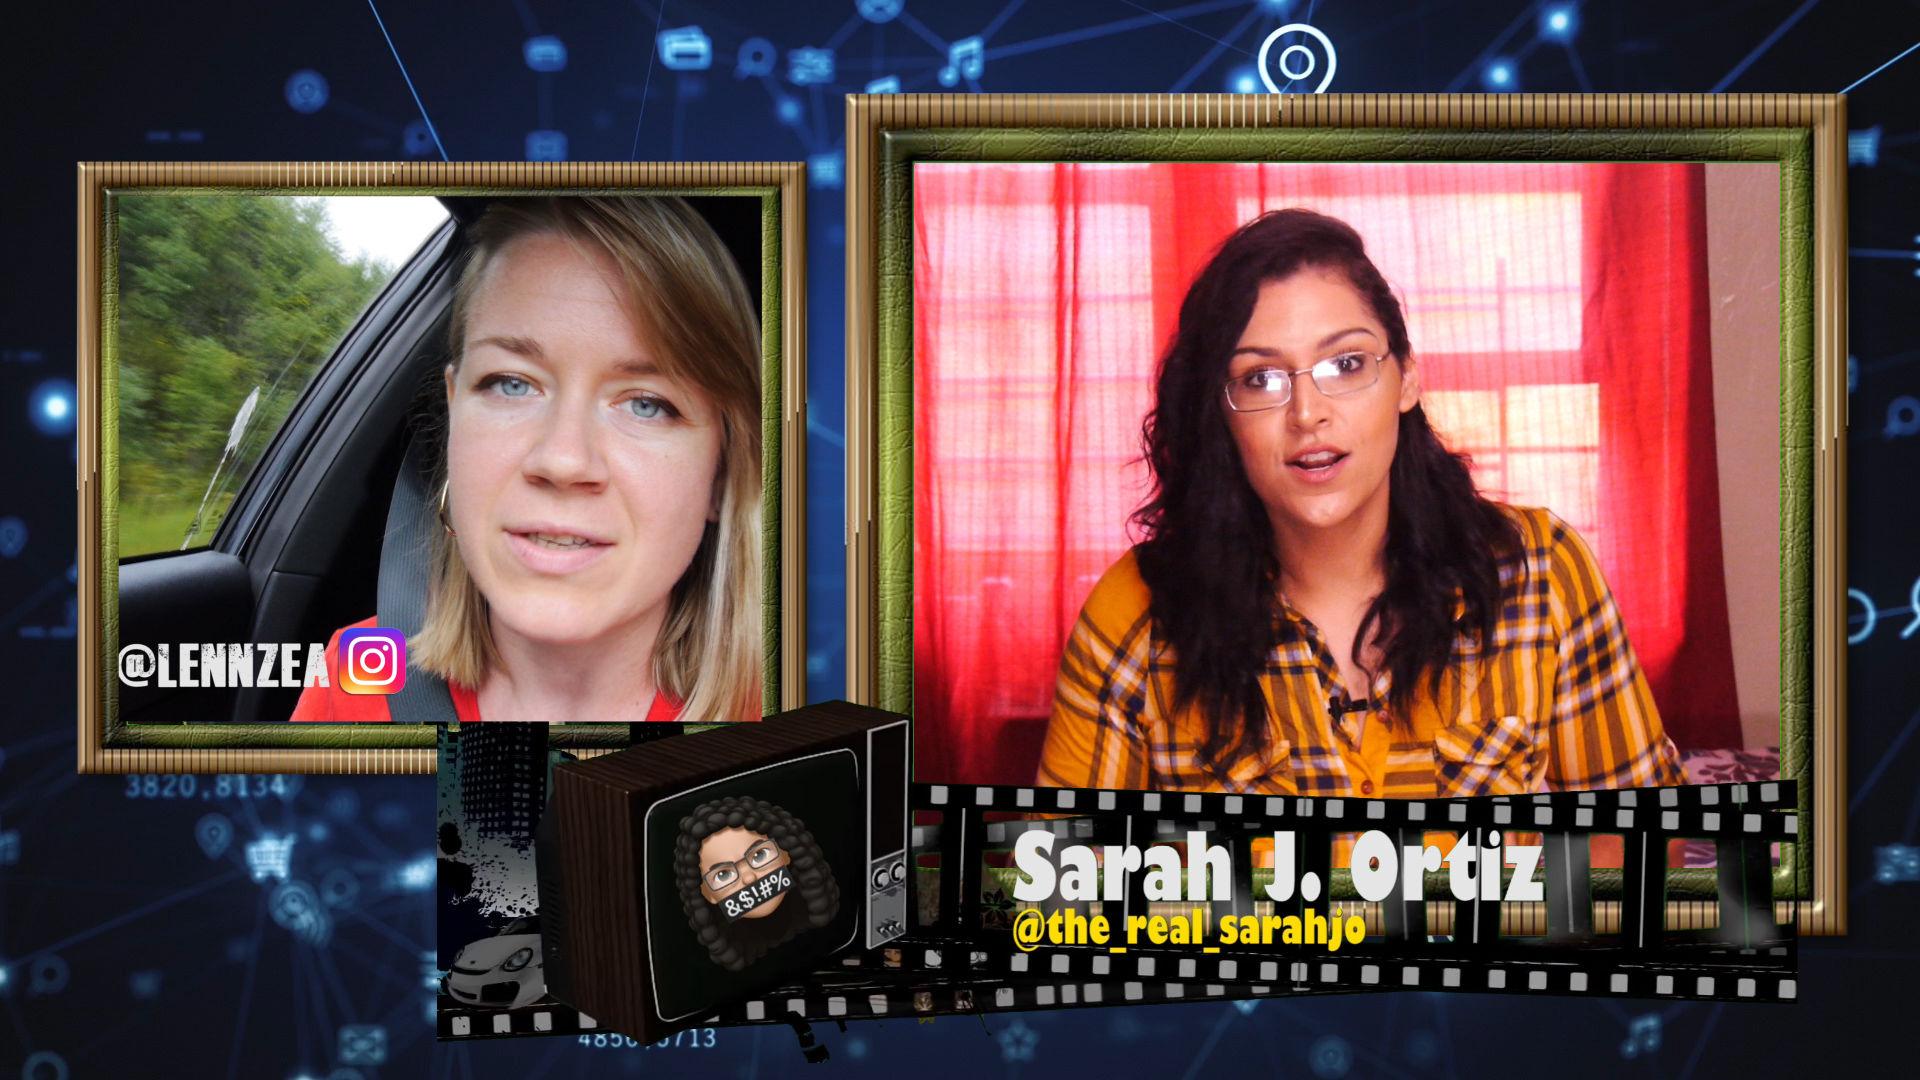 Sarah J Ortiz UNCUT - The CV19 Viral Edition: CORONA WHAT? (Promo)